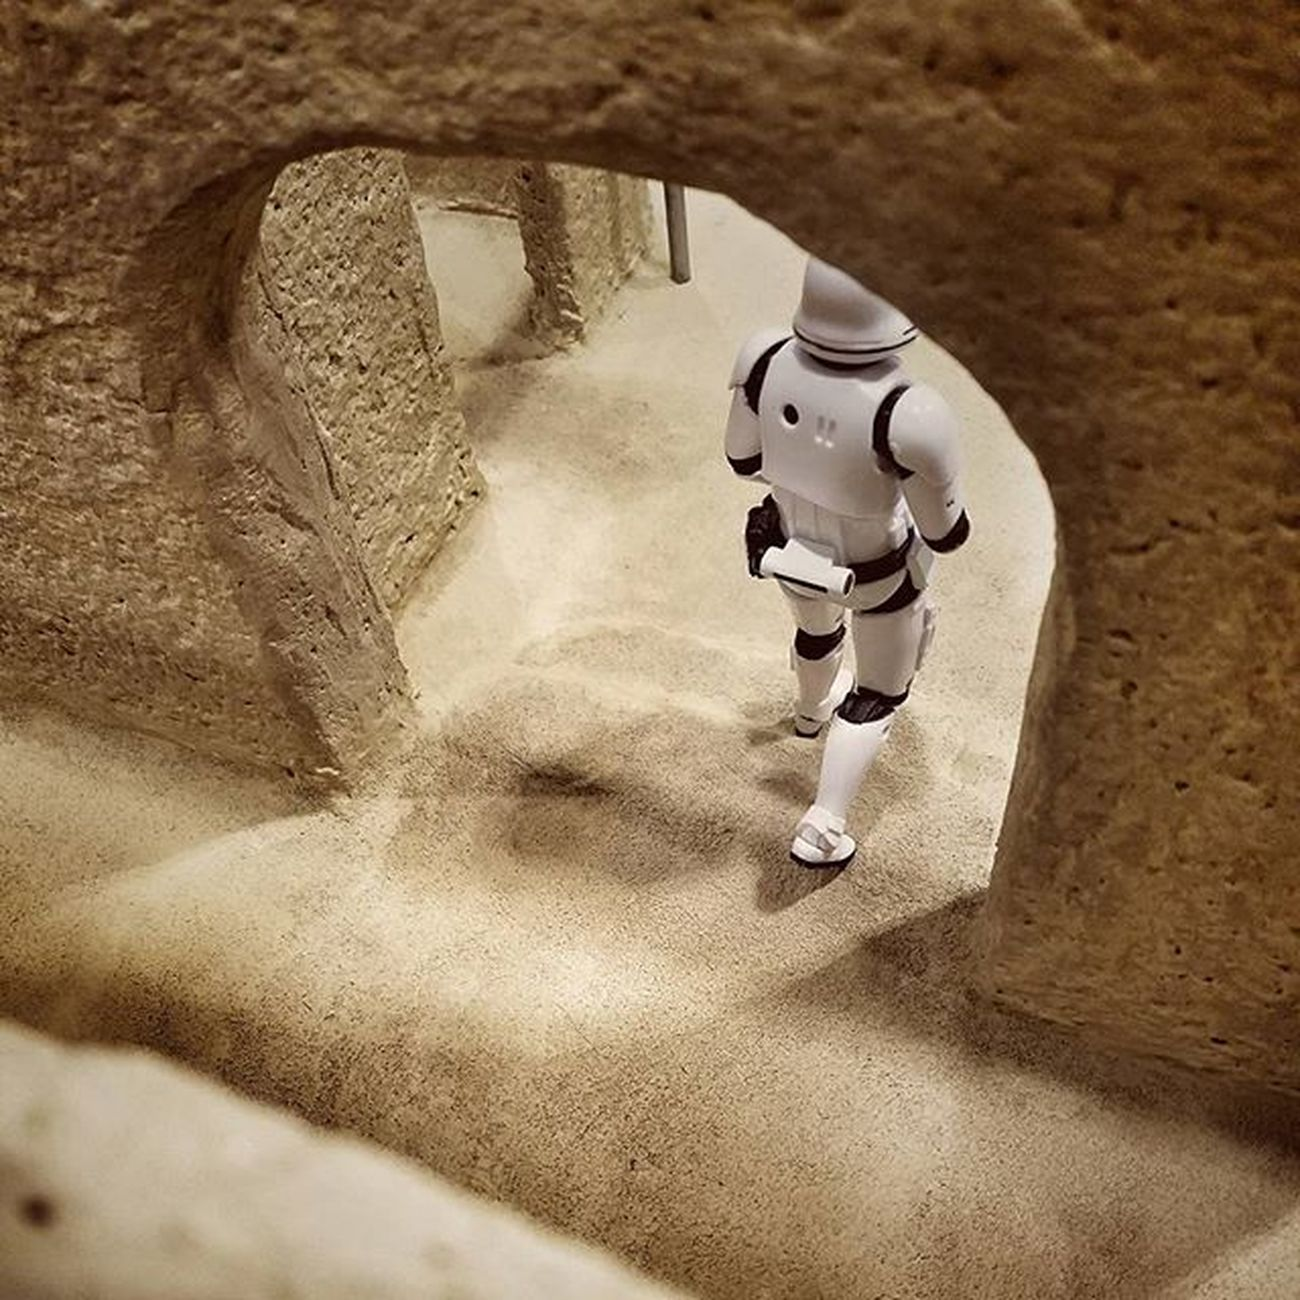 Test shot before props added to Sandtooine Tatooine Starwarstoyfigures Starwars Starwarsblackseries Blackseries Starwarstheblackseries Ihatesand Moistureevaporators Moisturefarm Diorama Wanted Wantedposter Droids Hansolo